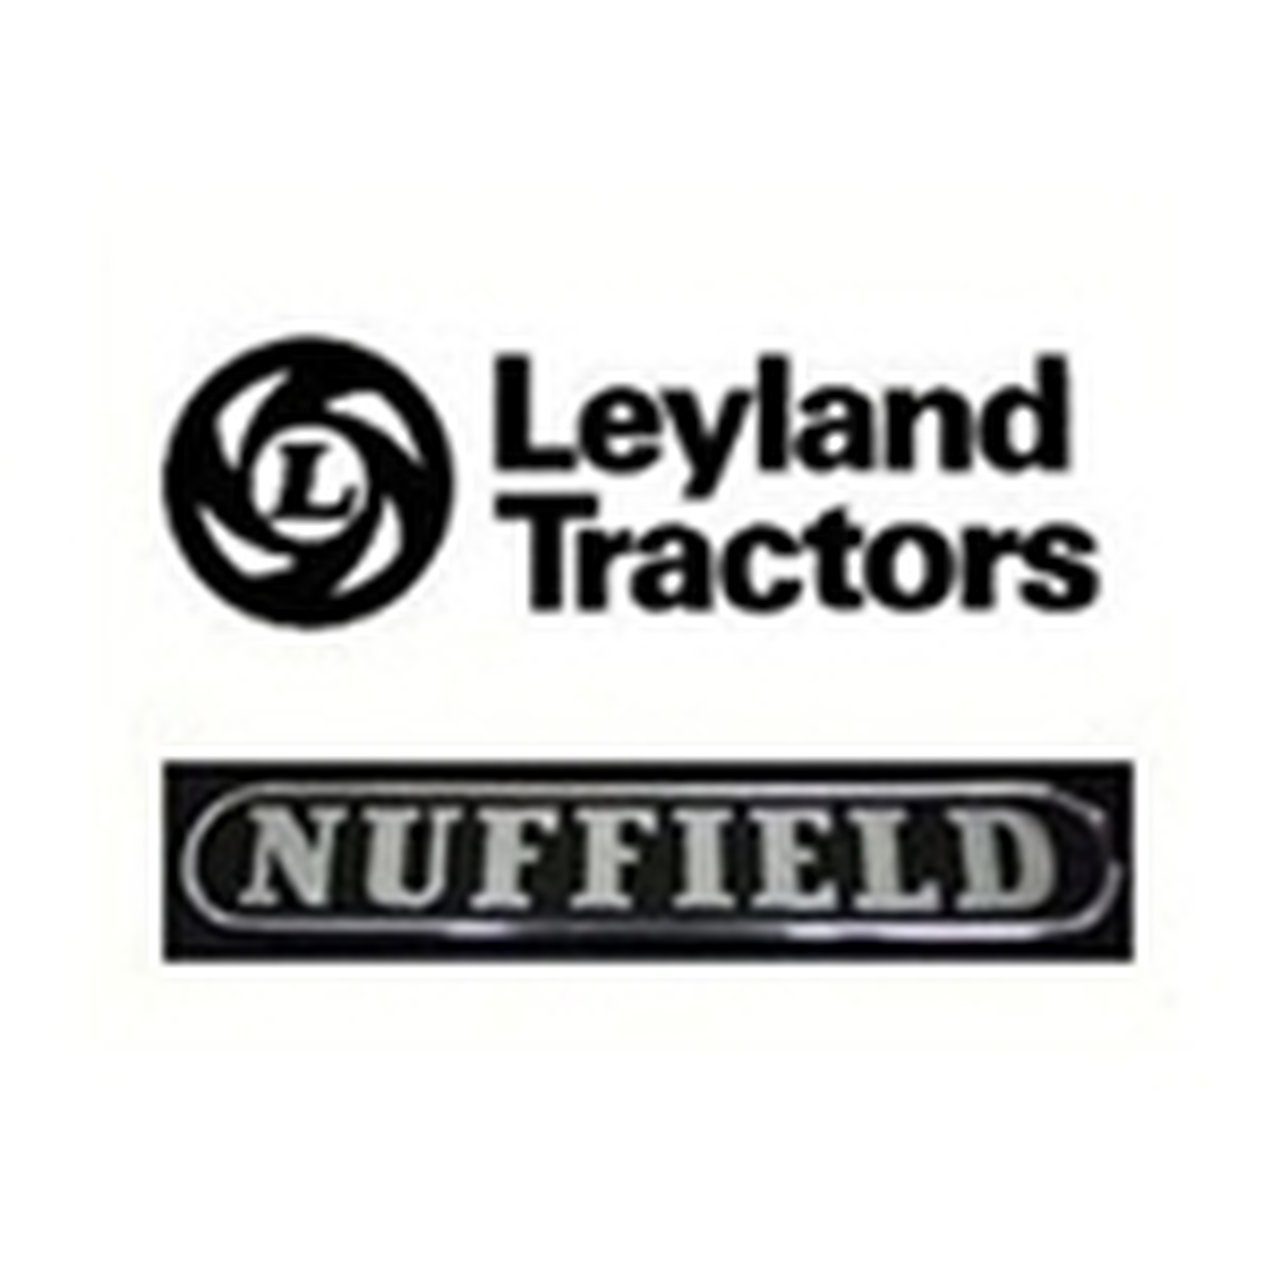 Leyland Nuffield